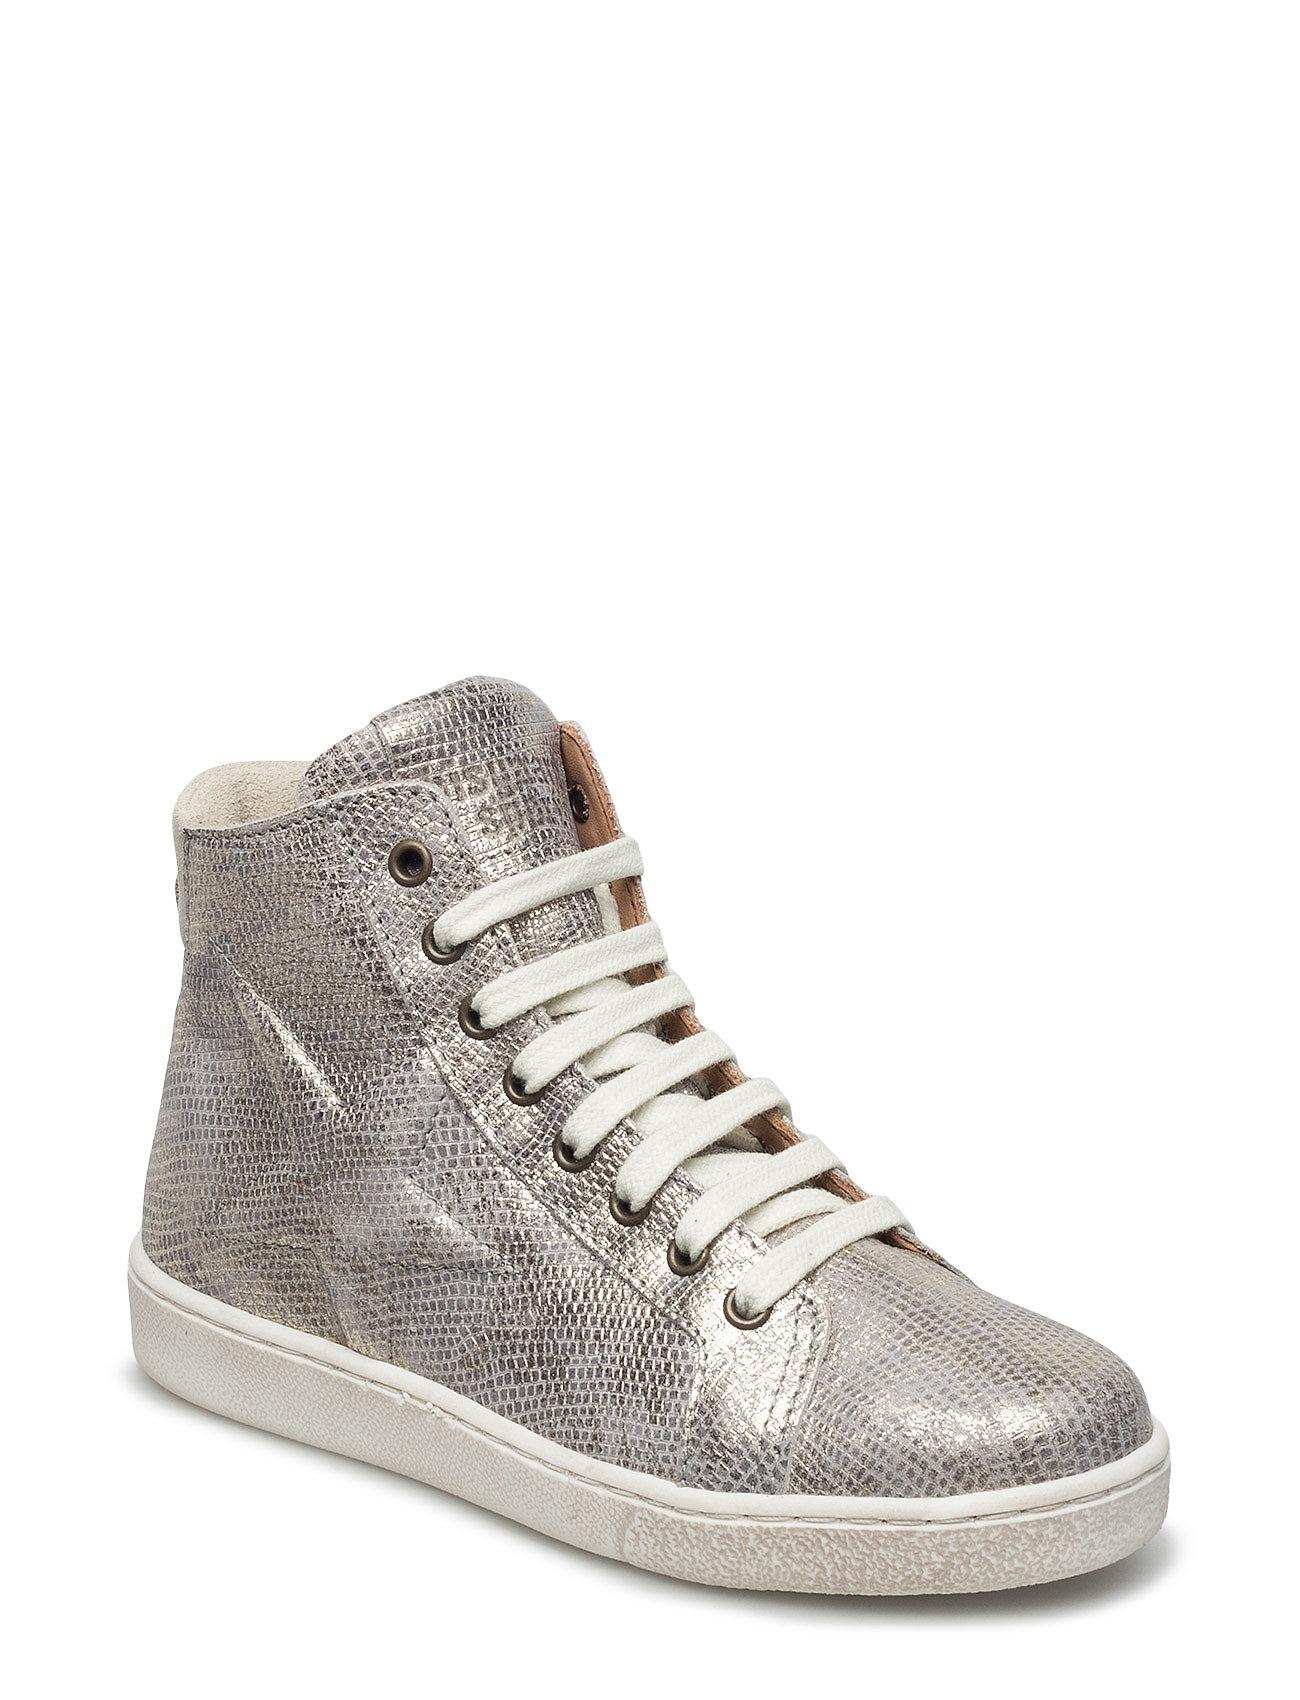 Shoe With Laces Bisgaard Sko & Sneakers til Børn i